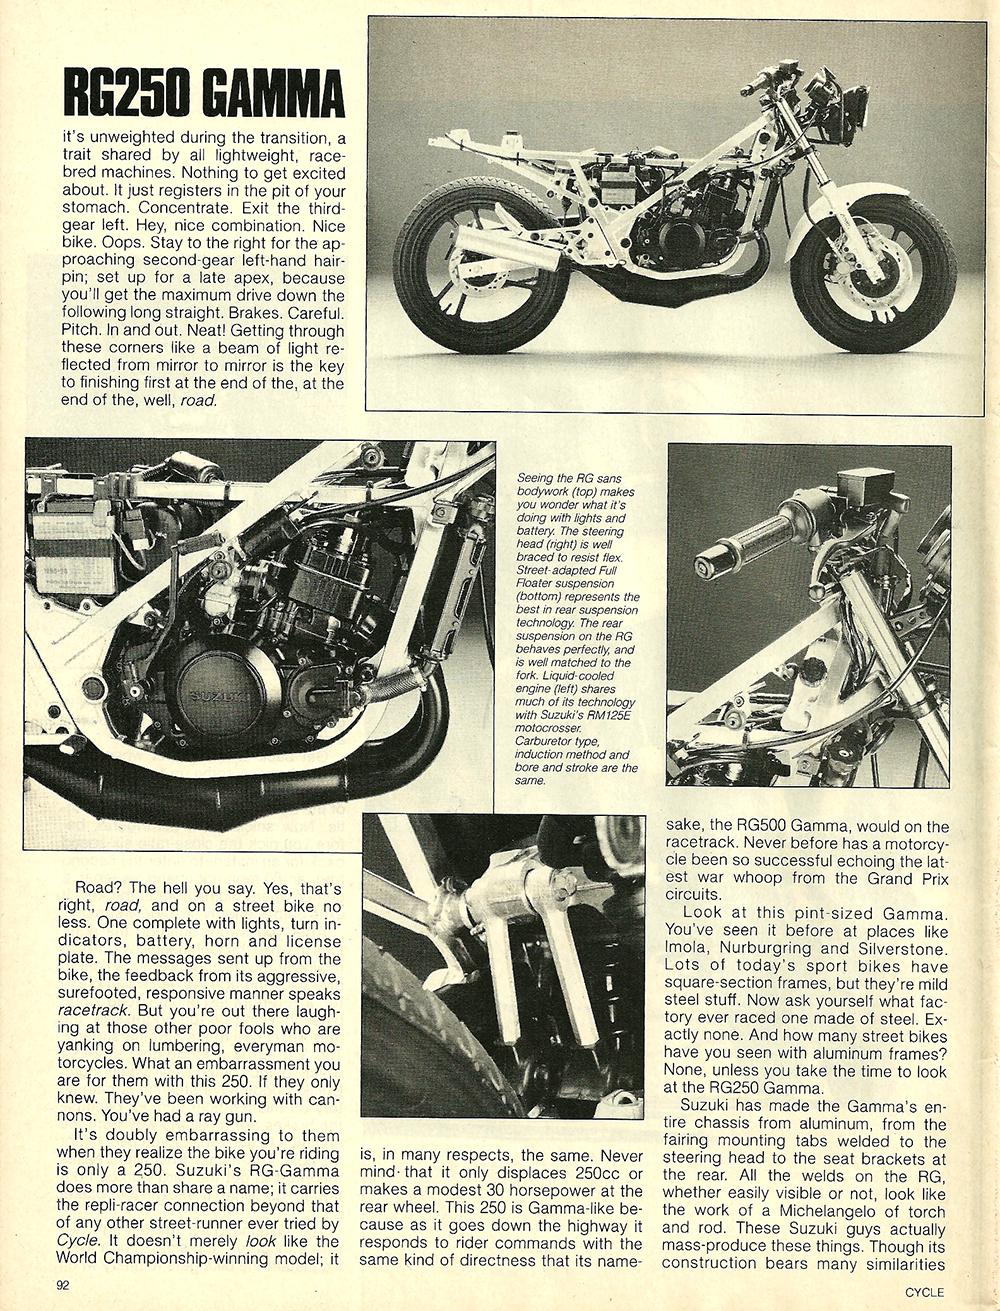 1984 Suzuki RG250 Gamma road test 5.jpg